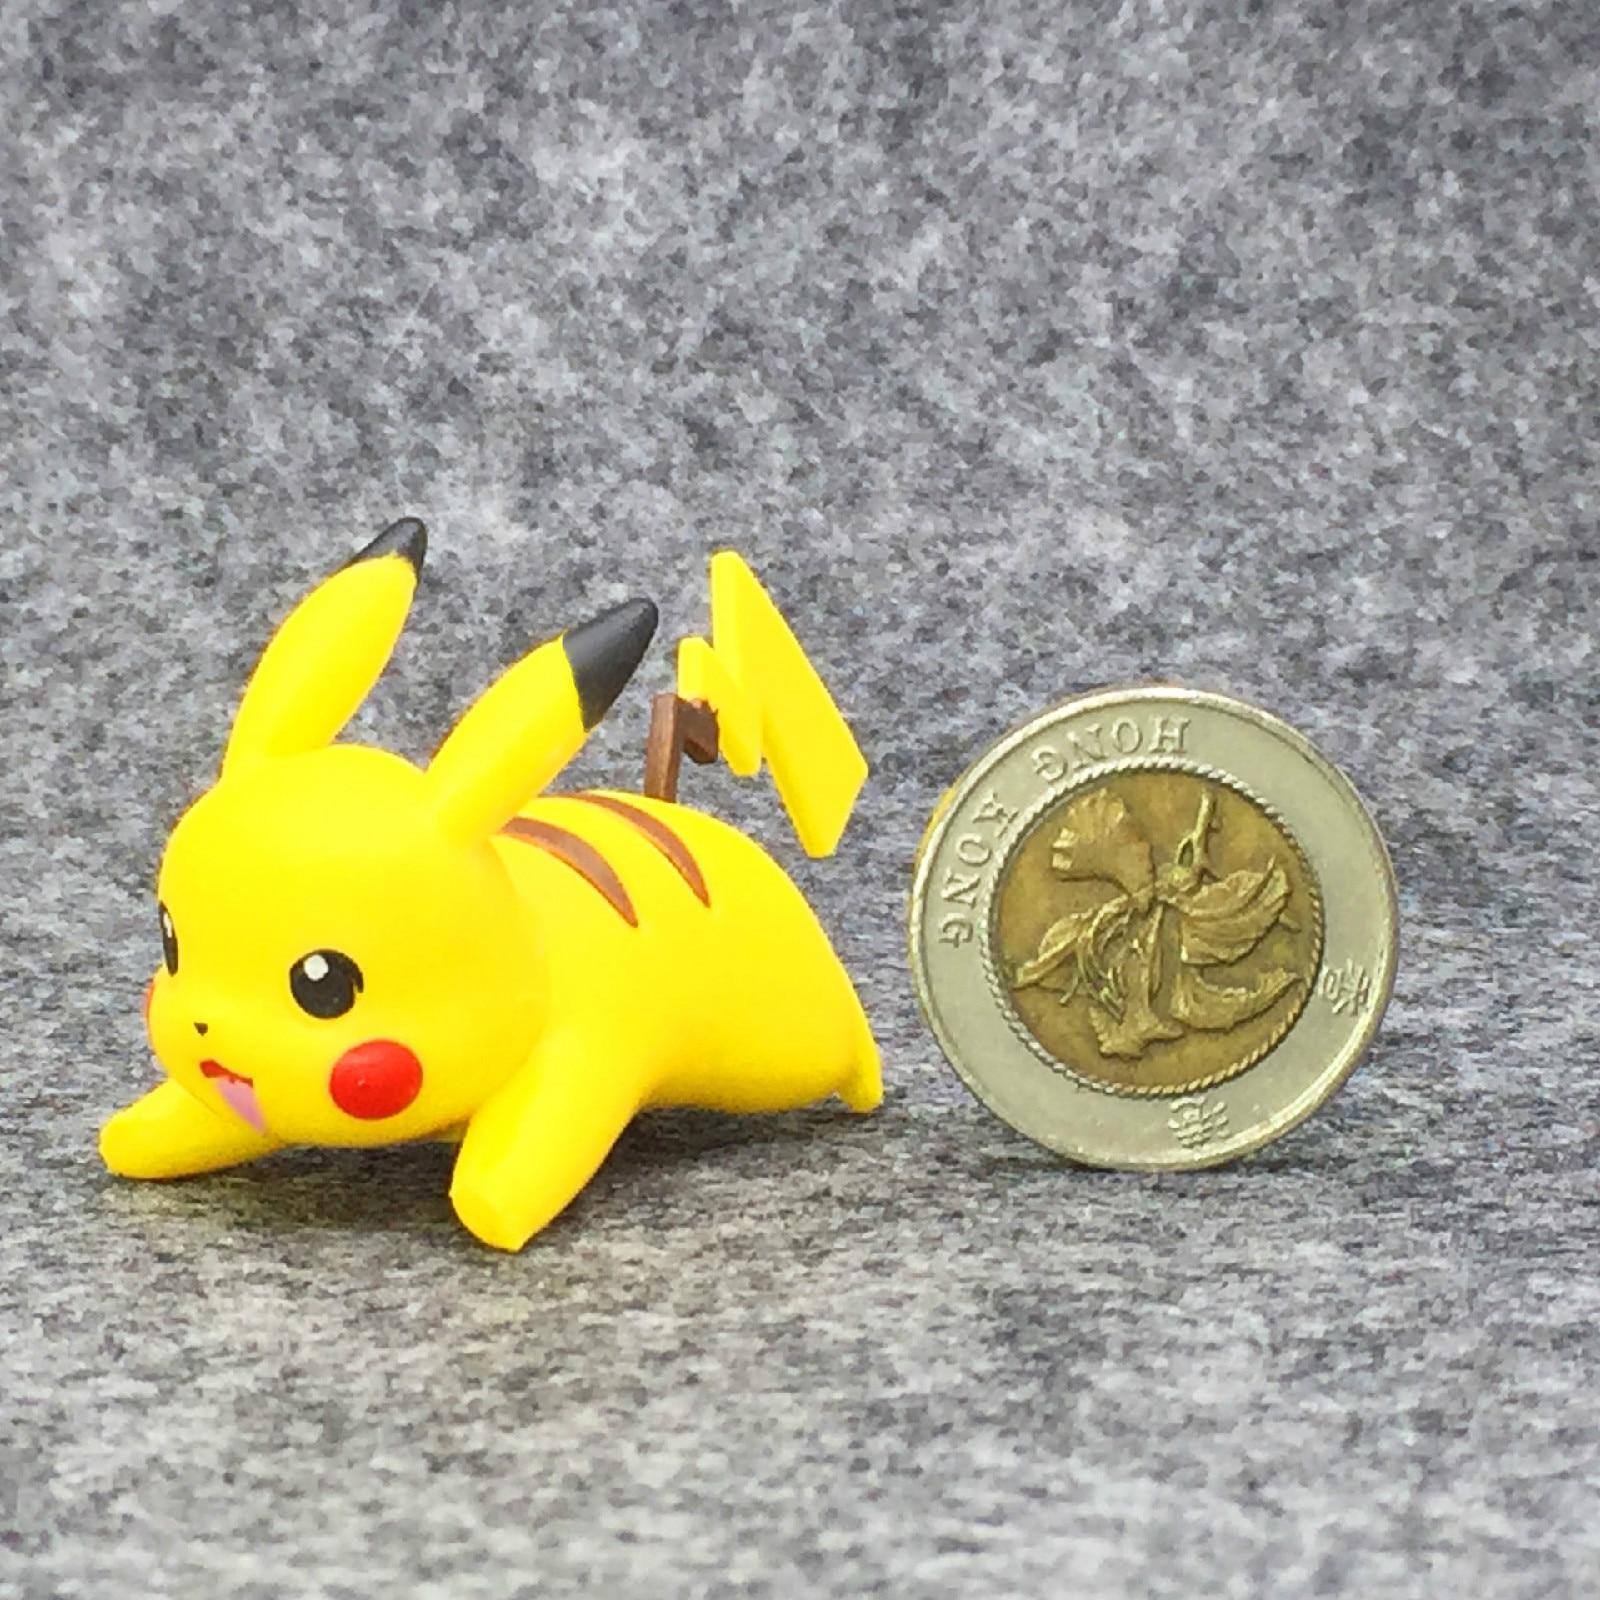 TAKARA TOMY Pokemon 4-6cm Charmander Popplio Litten Pikachu Rowlet Treecko Eevee Fennekin Greninja Anime Action Figure Dolls Toy